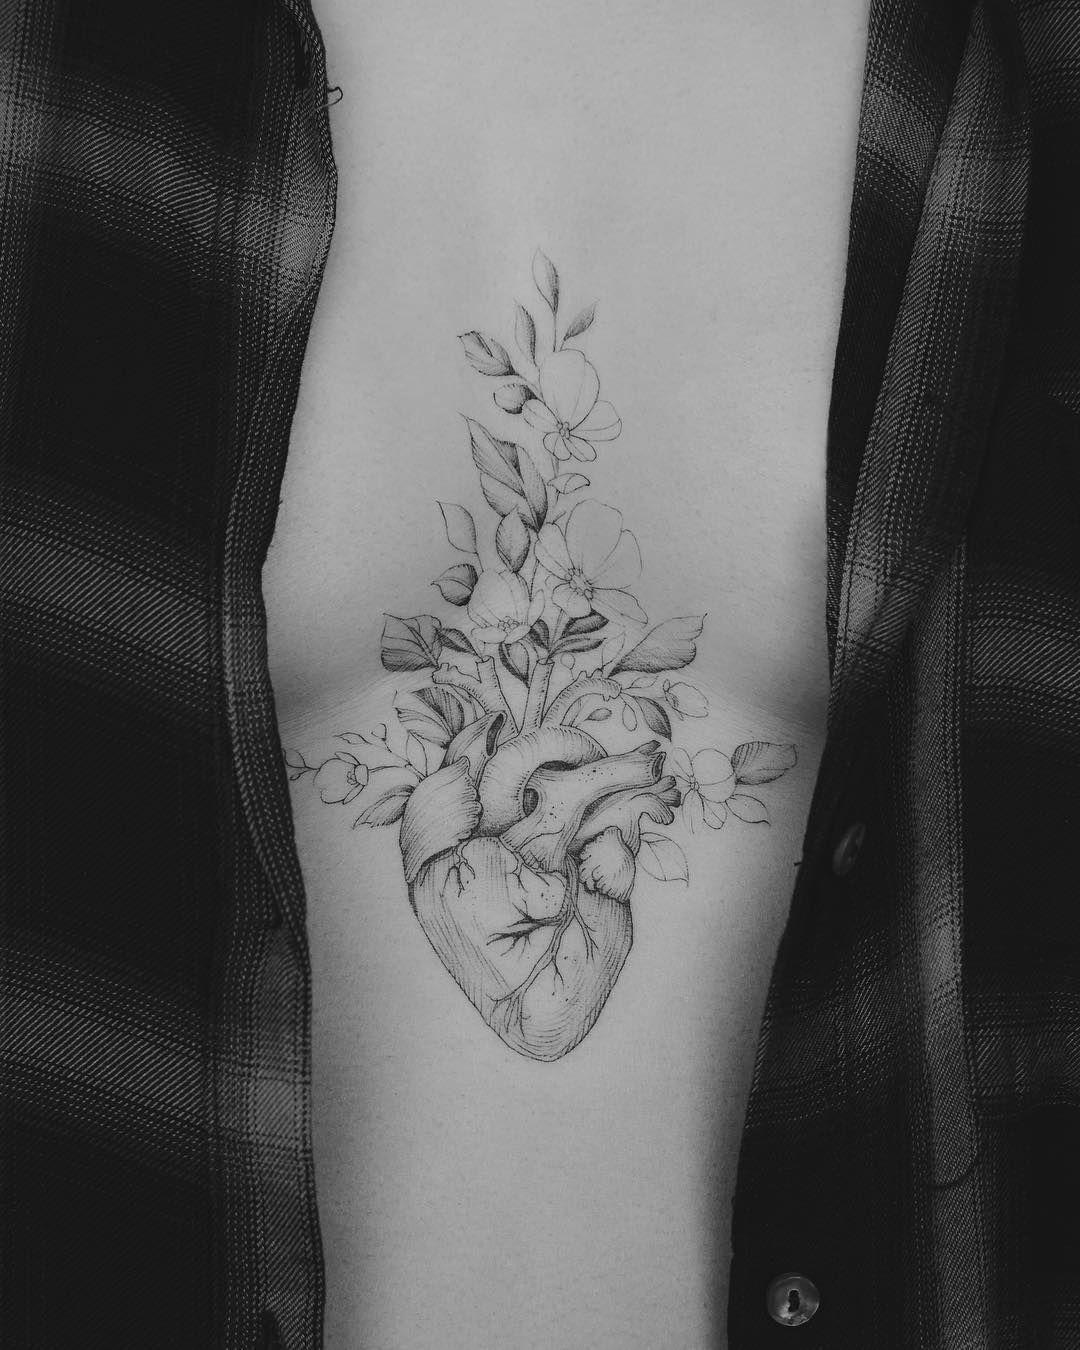 Tendance Tattoo 120 Conceptions Realistes De Tatouage De Coeur